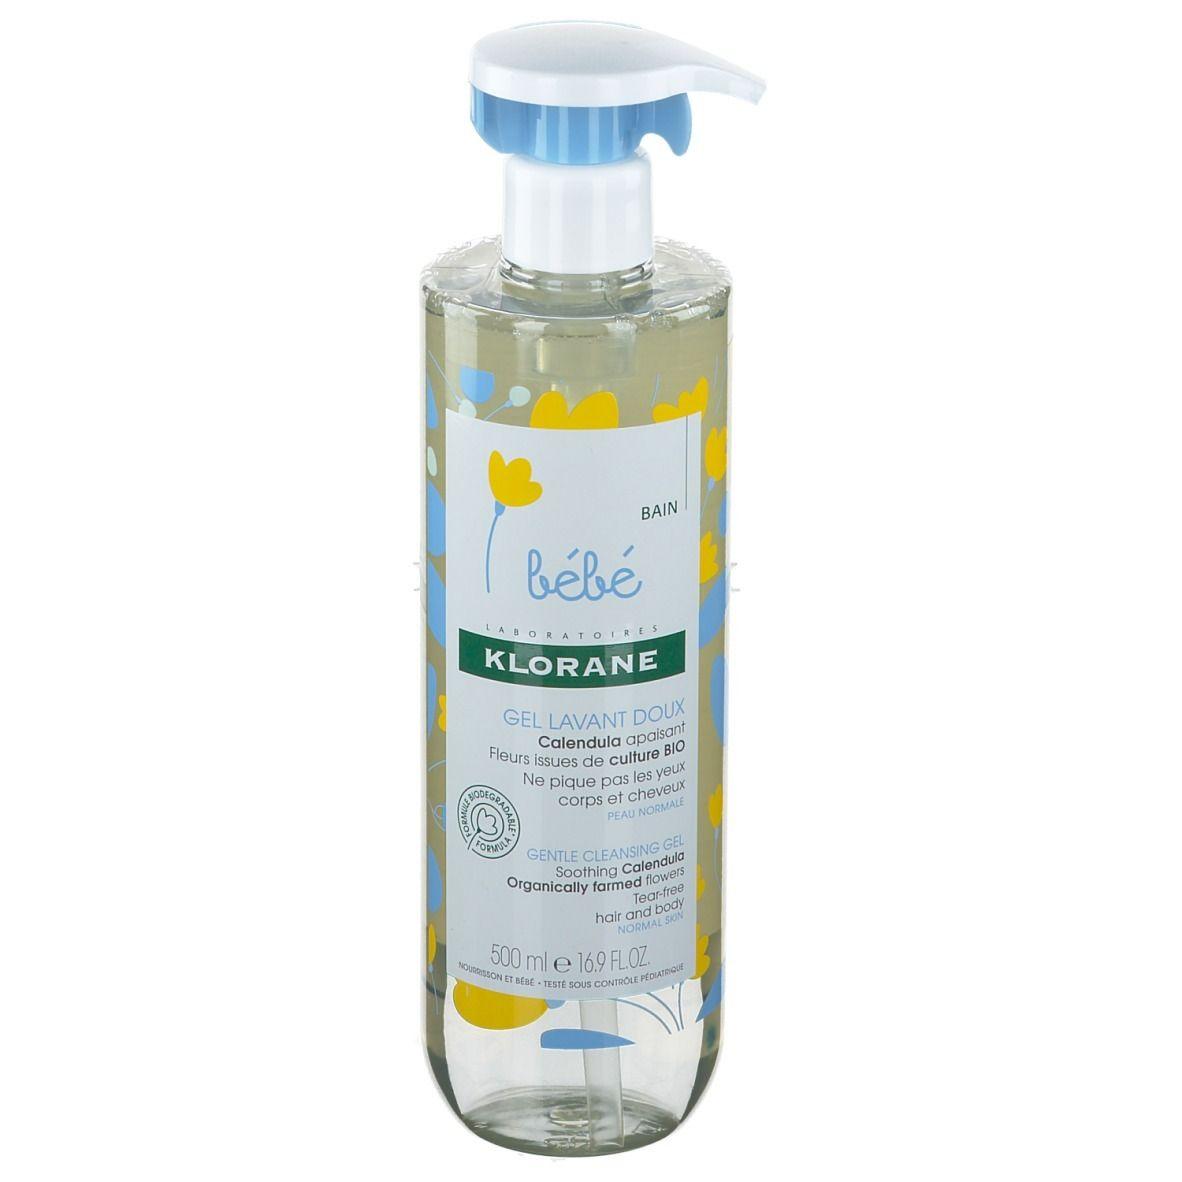 Klorane Bébé Bain Gel Lavant Doux au Calendula Bio ml gel(s)